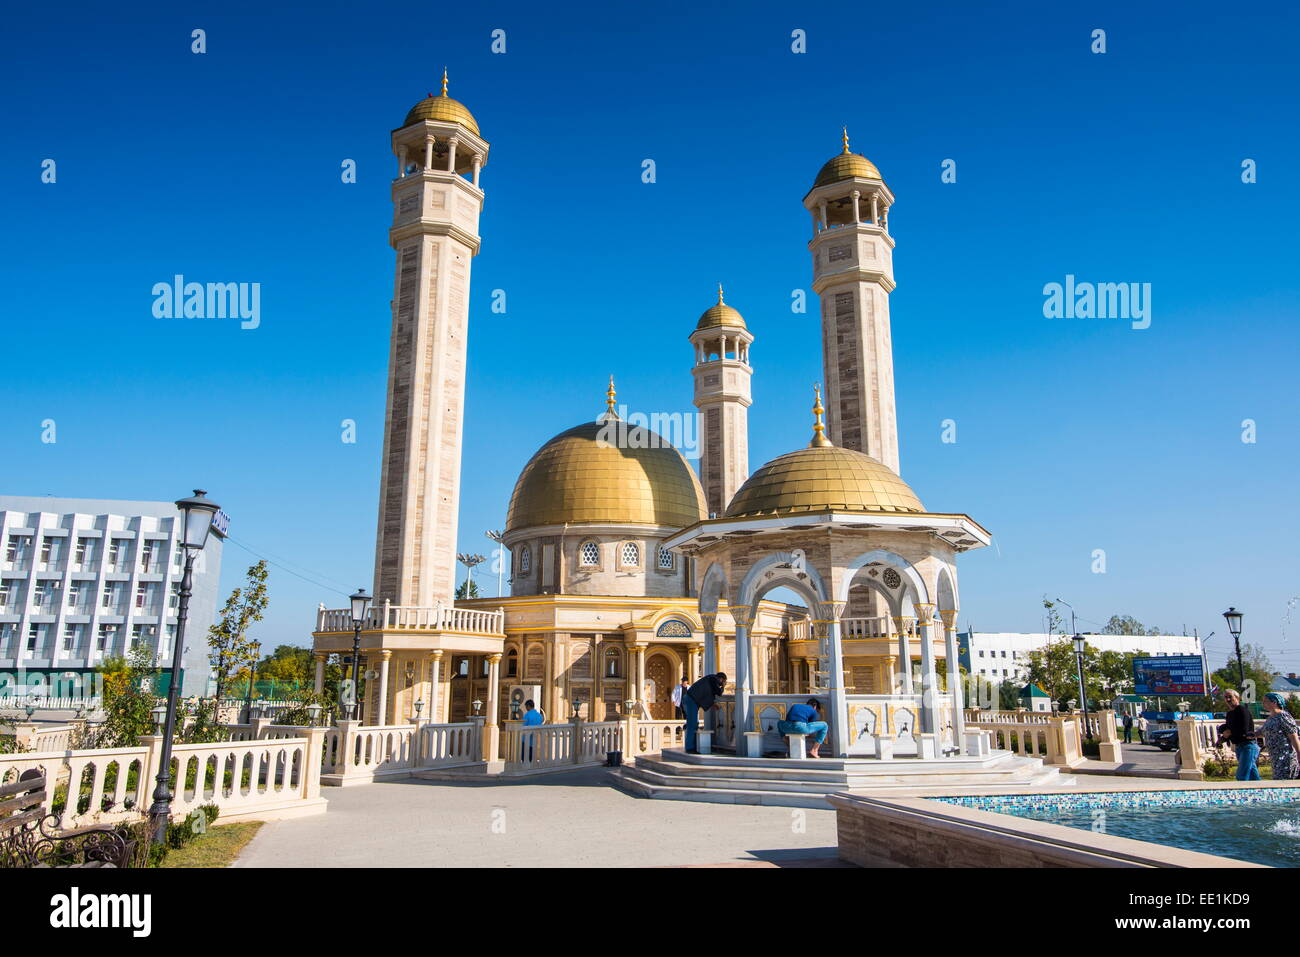 Yusuf Sakkazova Mosque. situated near Grozny Airport, Grozny, Chechnya, Caucasus, Russia, Europe - Stock Image